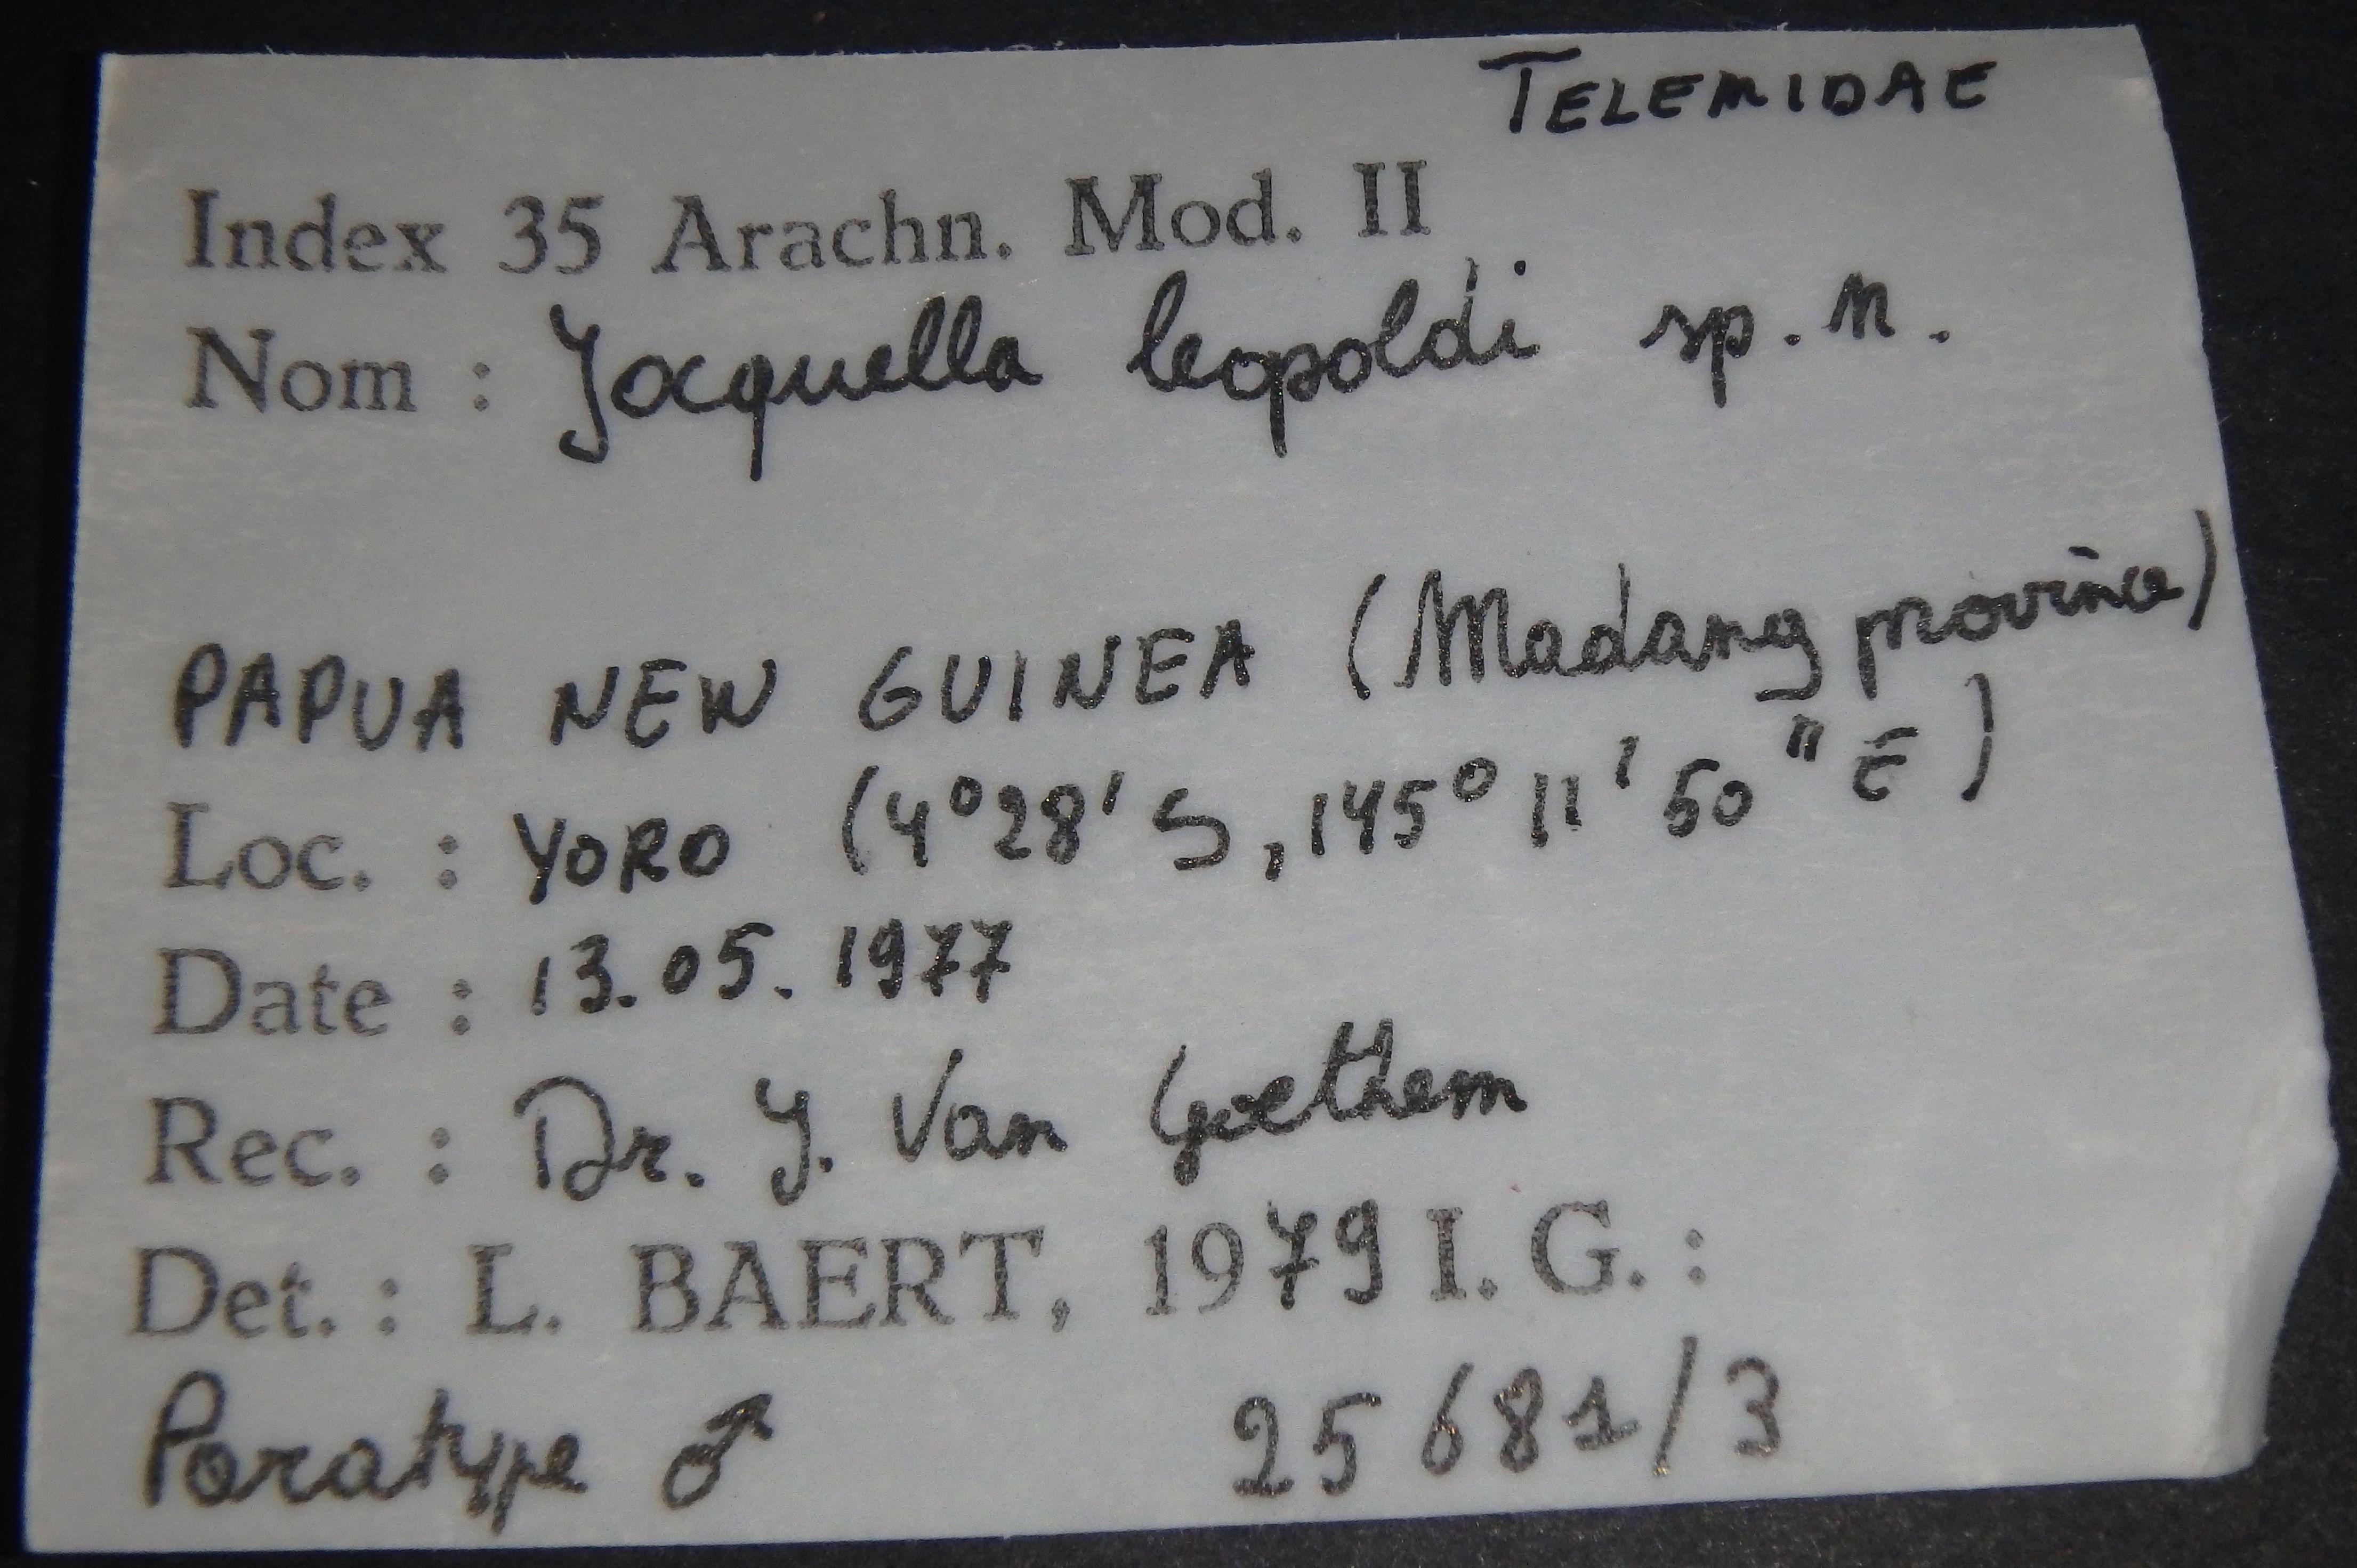 Jocquella leopoldi pt M Lb.JPG